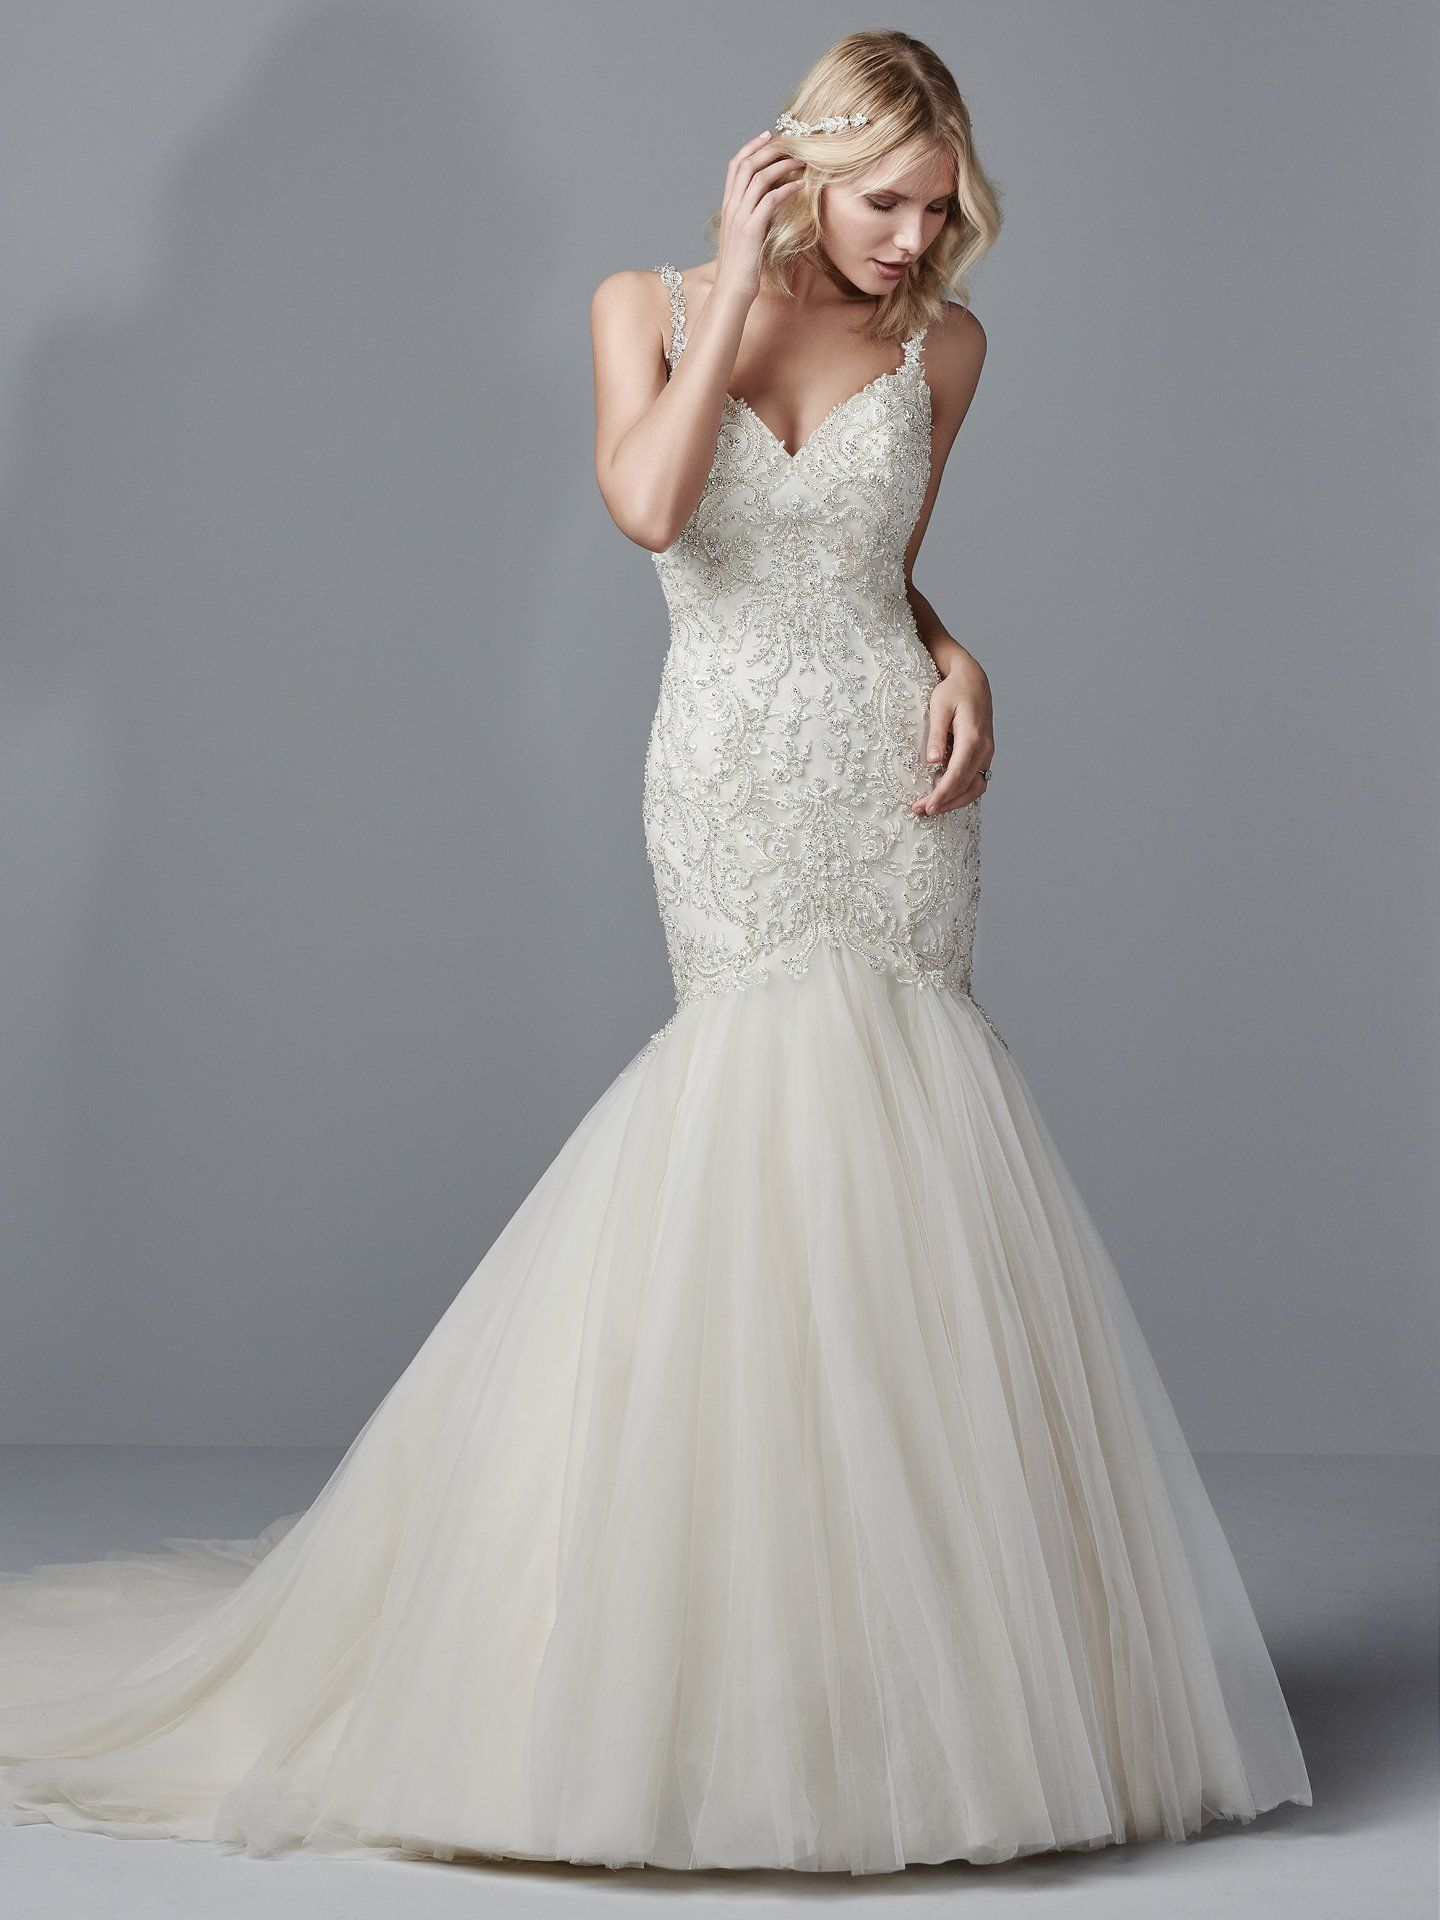 Eyelet wedding dress  Maggie Sottero Wedding Dresses  Sottero midgley and Wedding dress